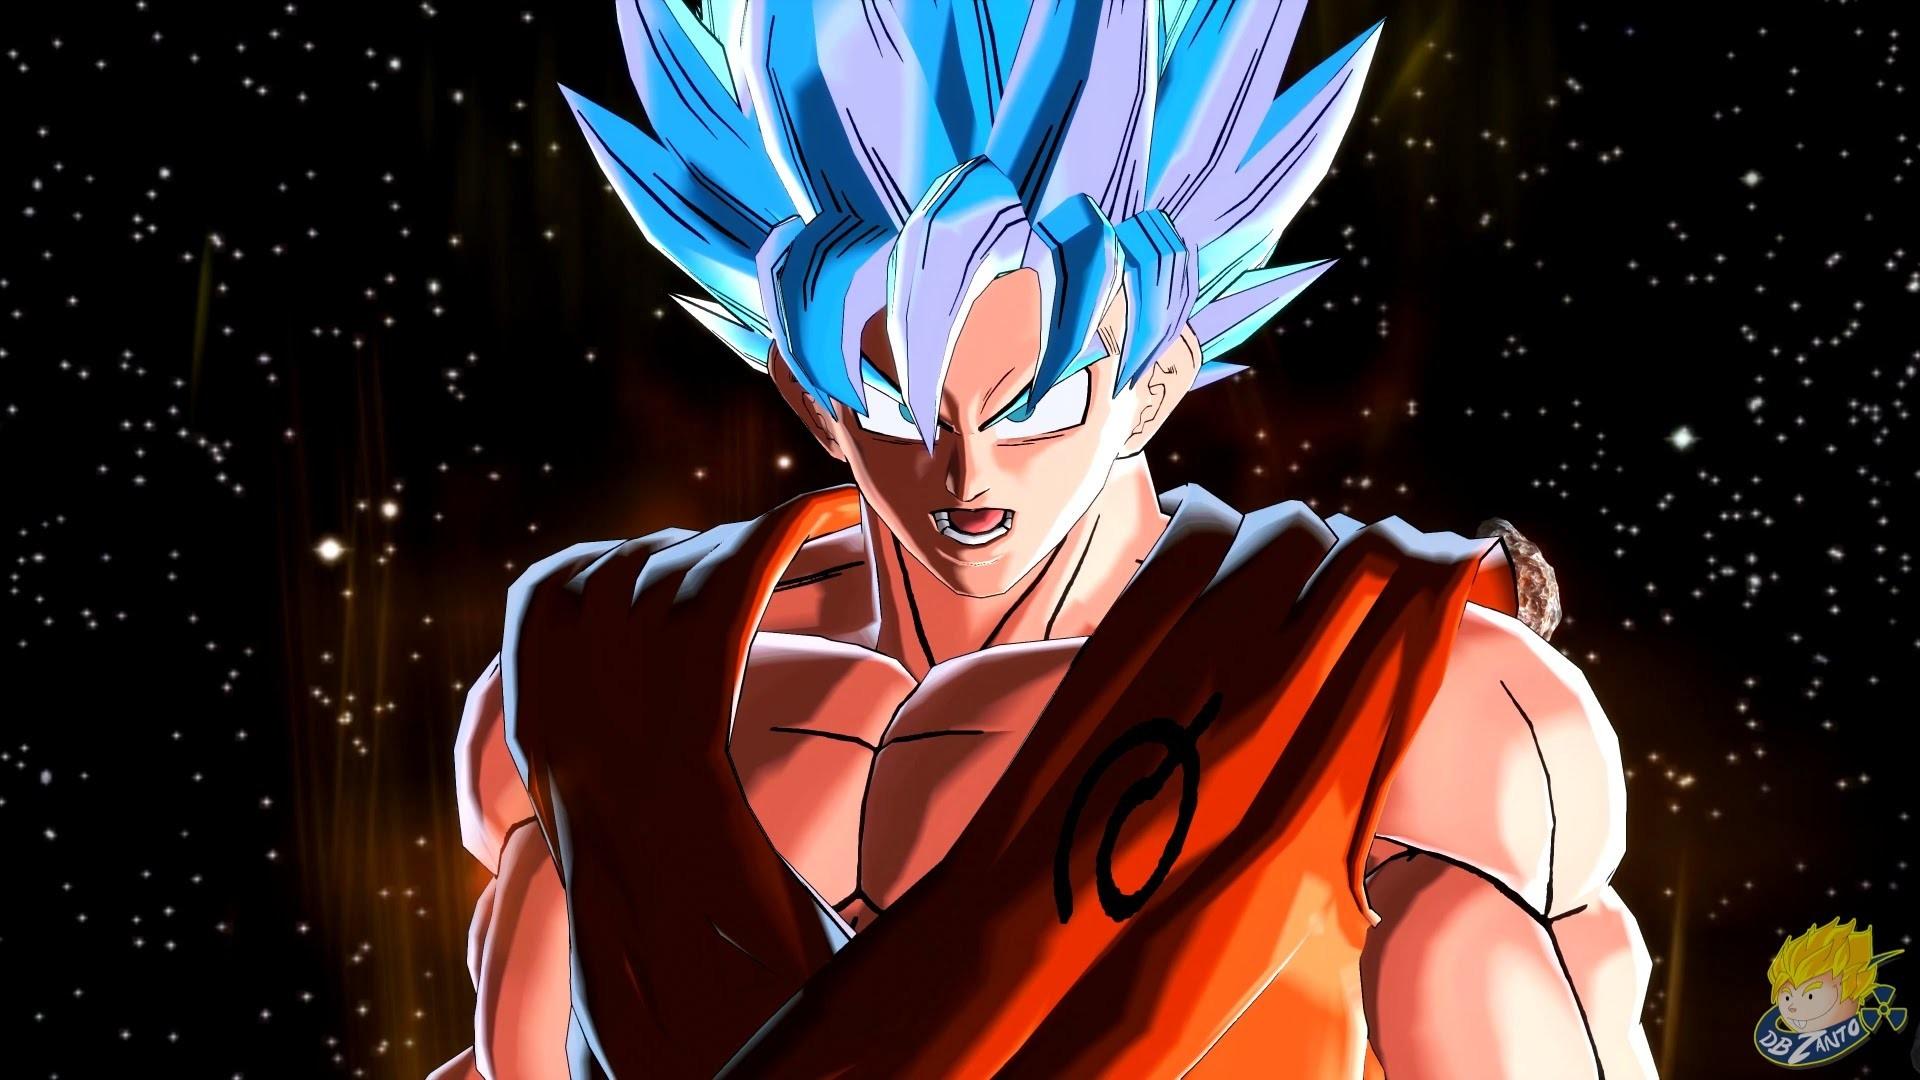 Dragon Ball Xenoverse (PC): SSGSS Goku Vs Golden Frieza Gameplay [MOD]  【60FPS 1080P】 – YouTube